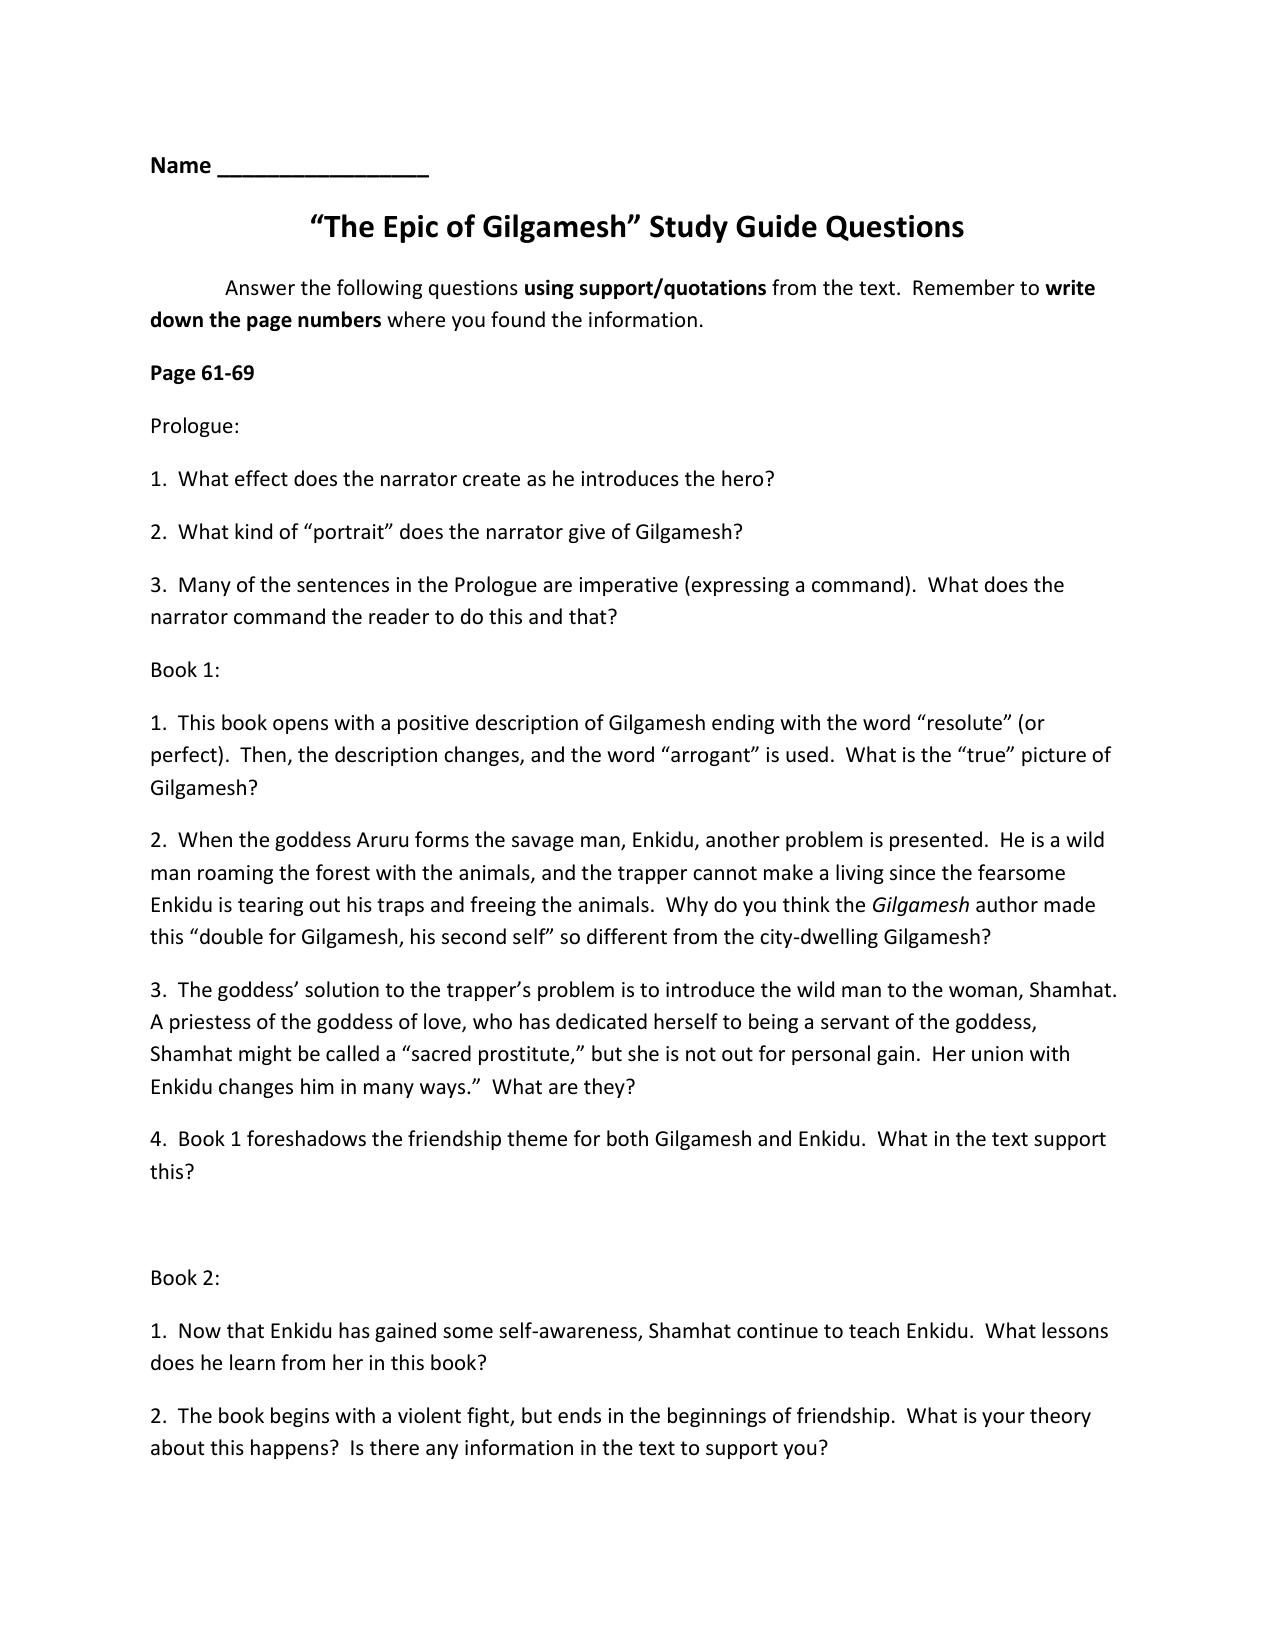 Essay on gilgamesh